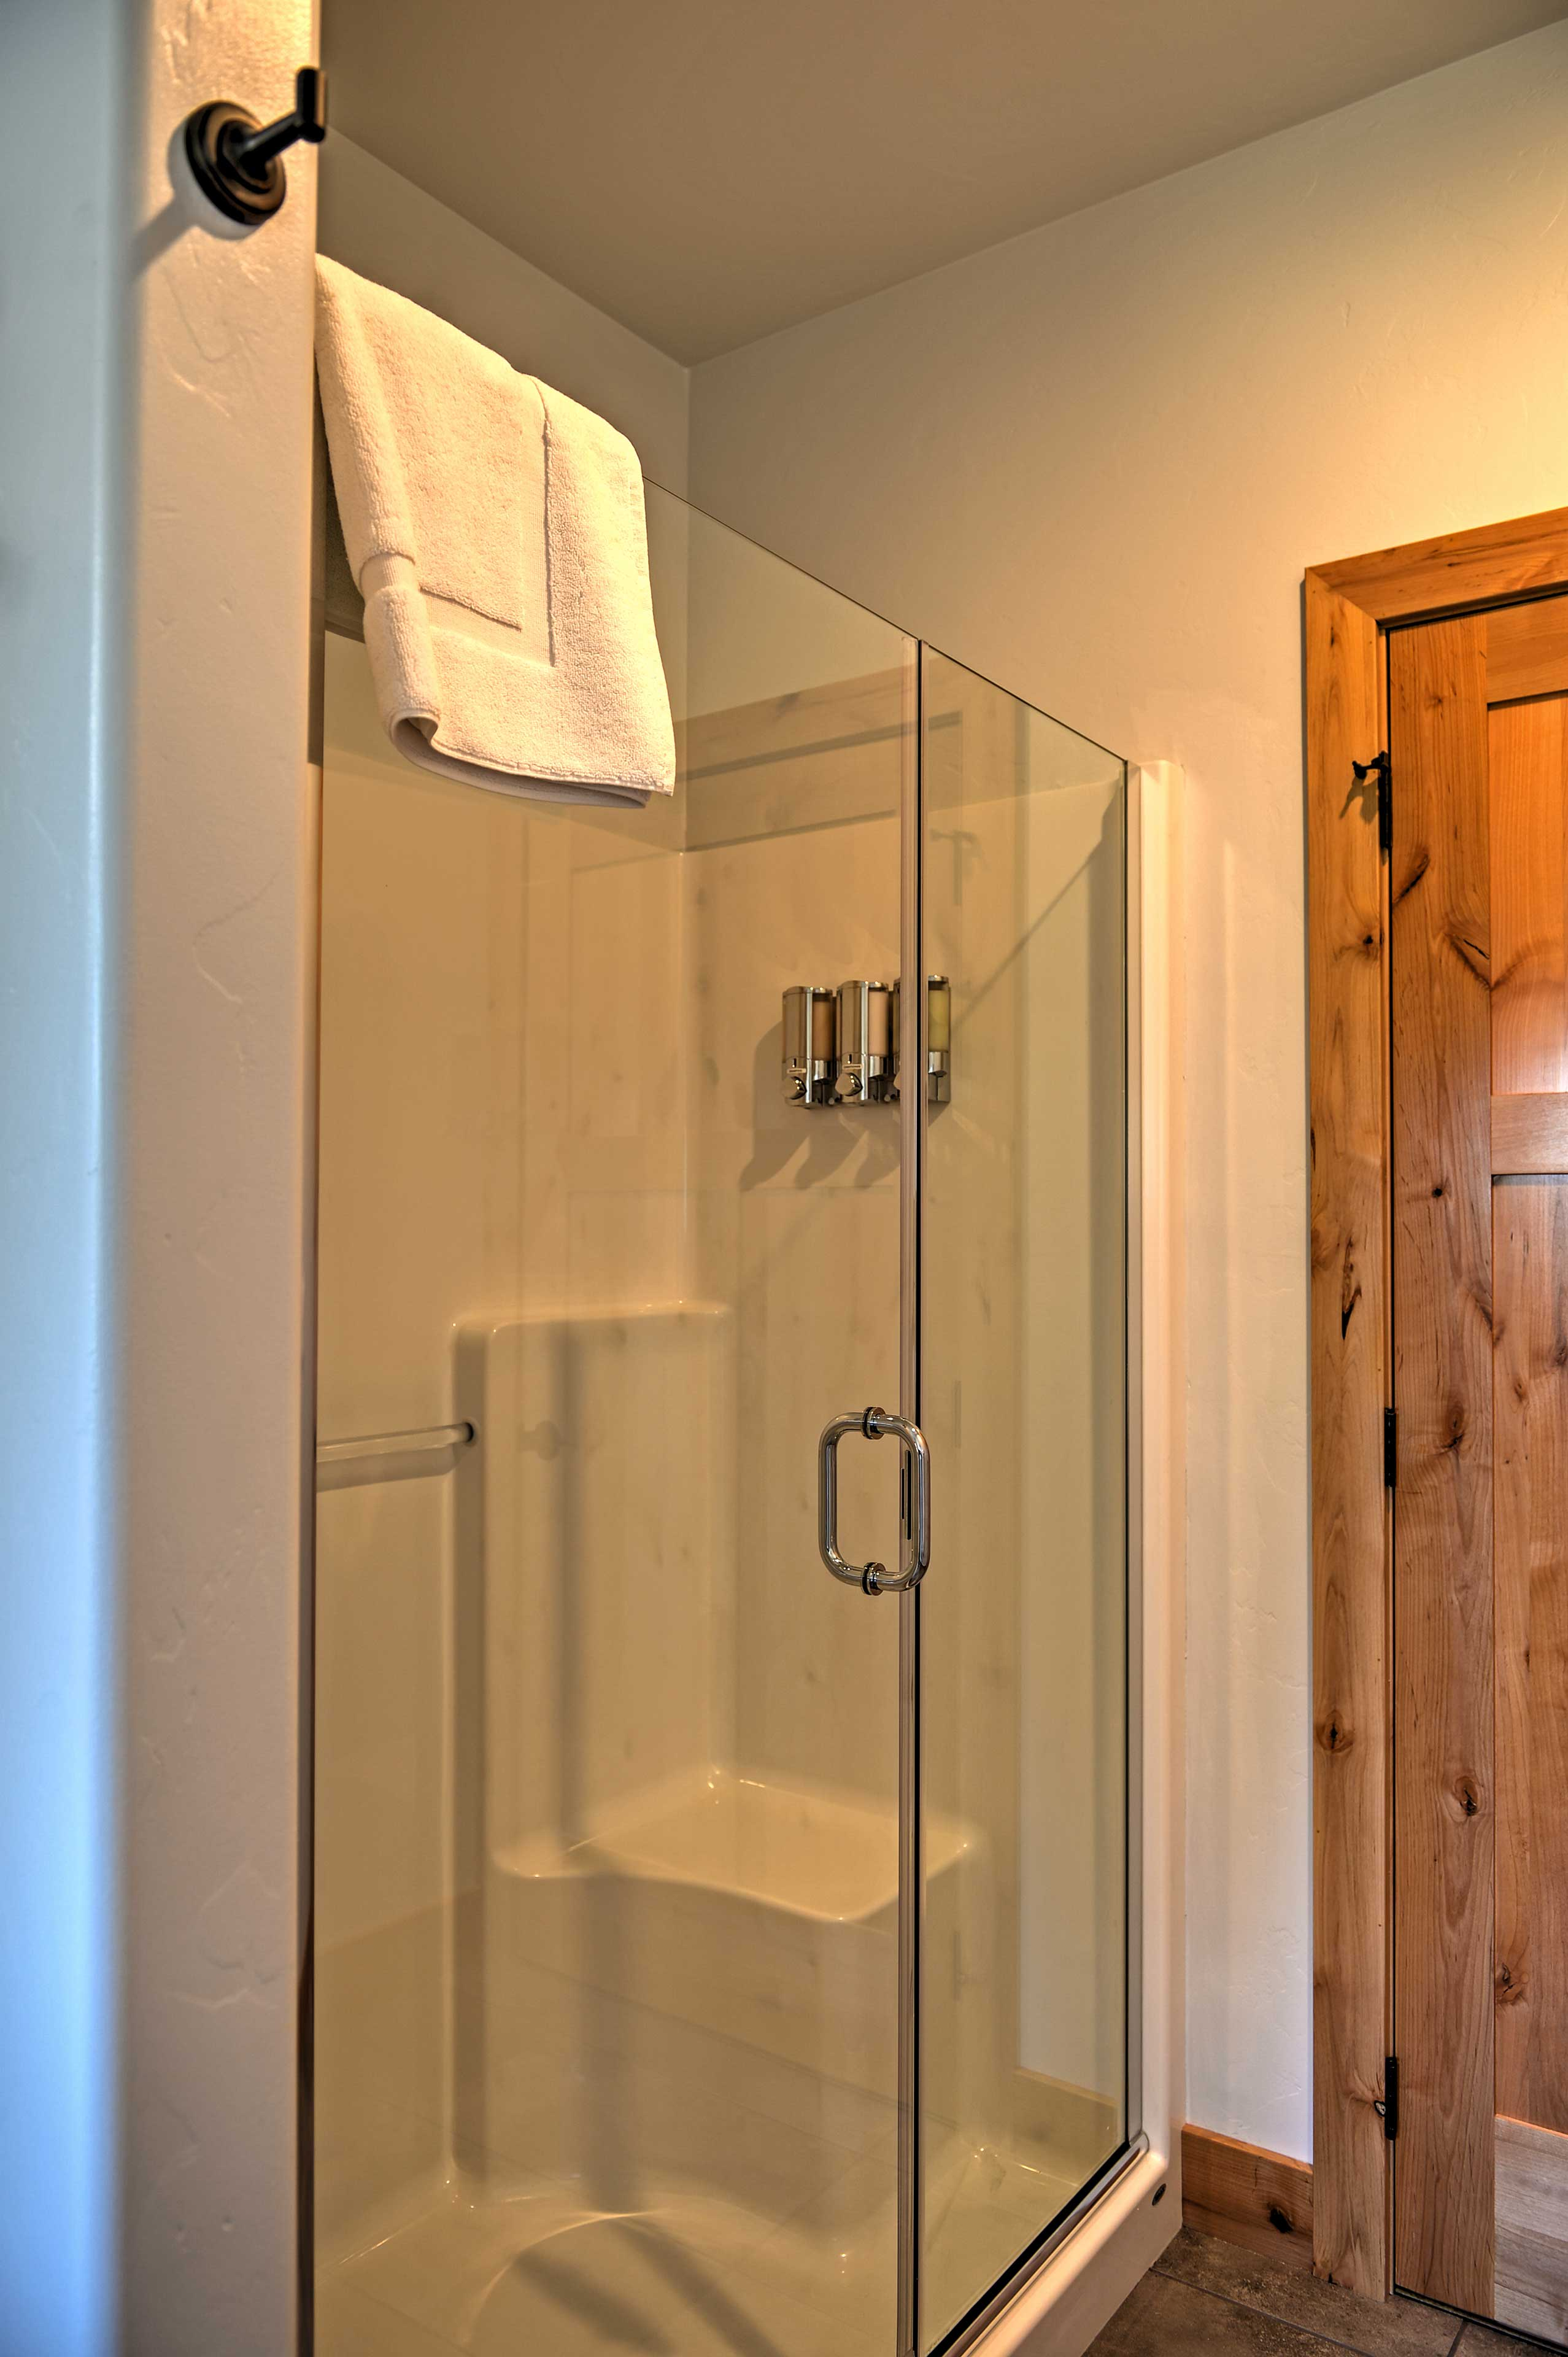 Refresh in the walk-in shower.